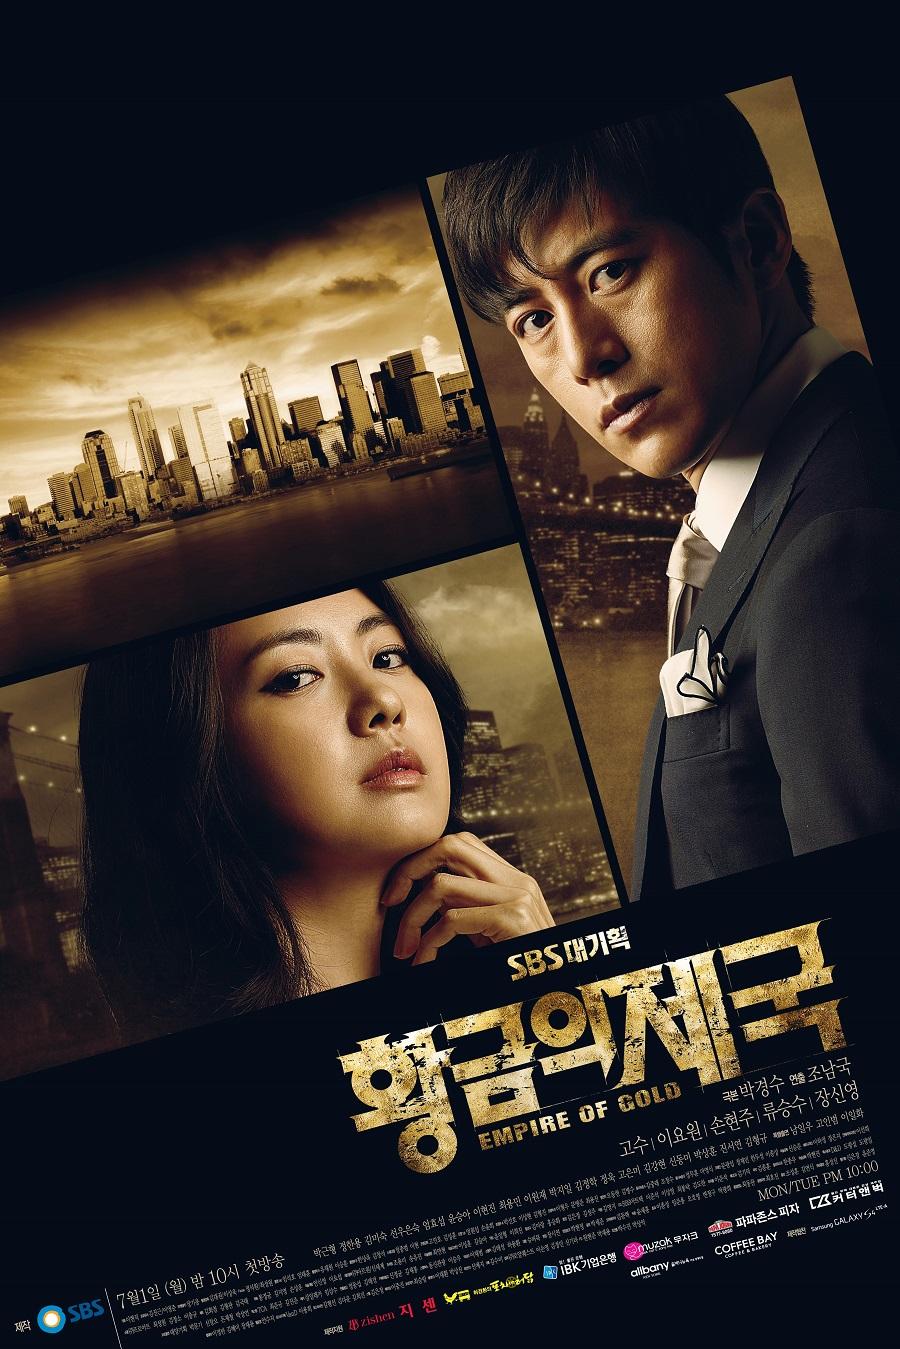 20130924_seoulbeats_empire_of_gold